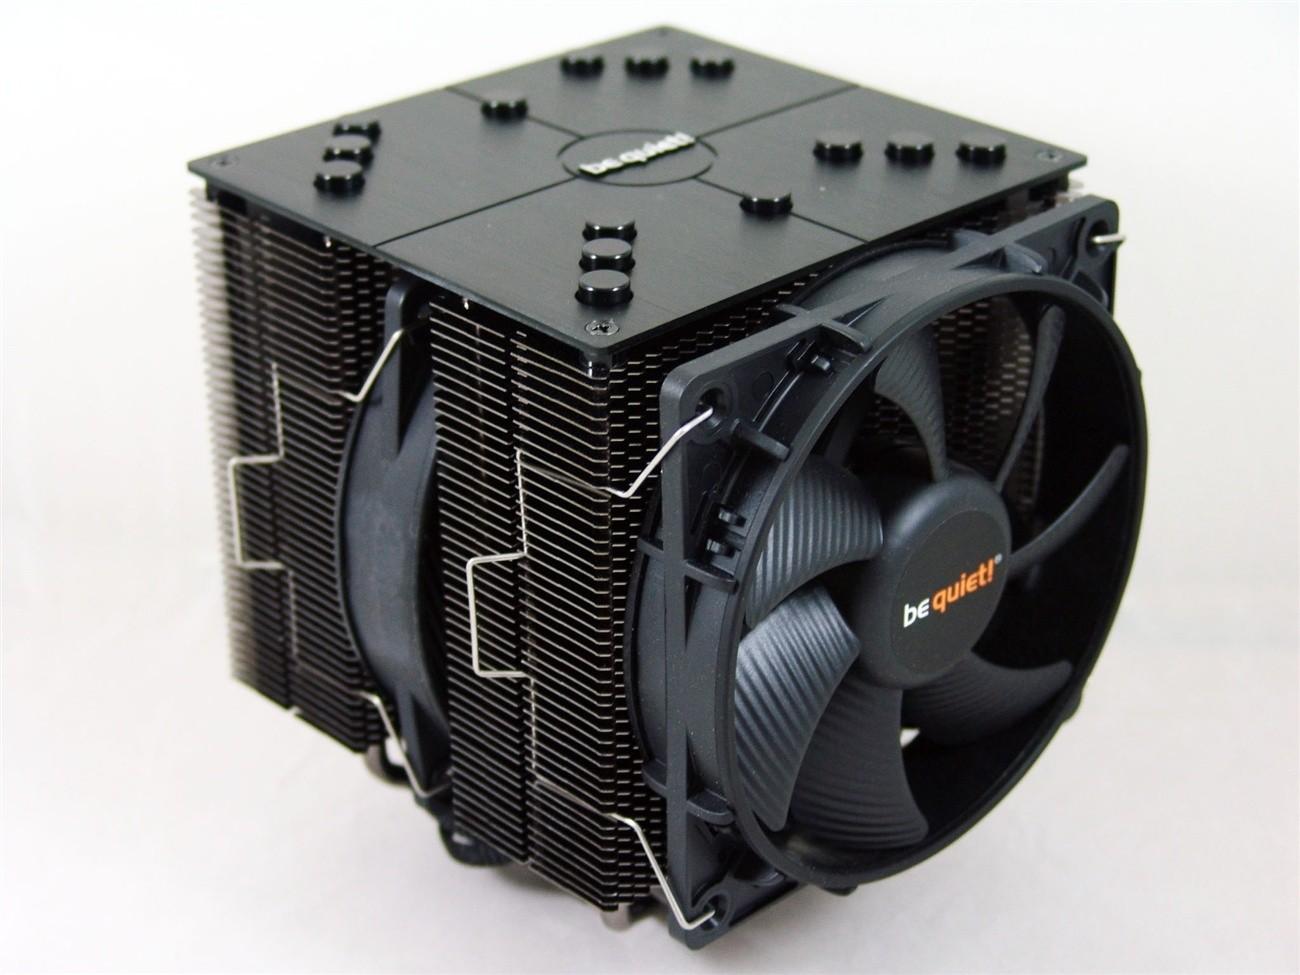 4753 99 be quiet dark rock pro 2 dual tower cpu cooler review full.jpg